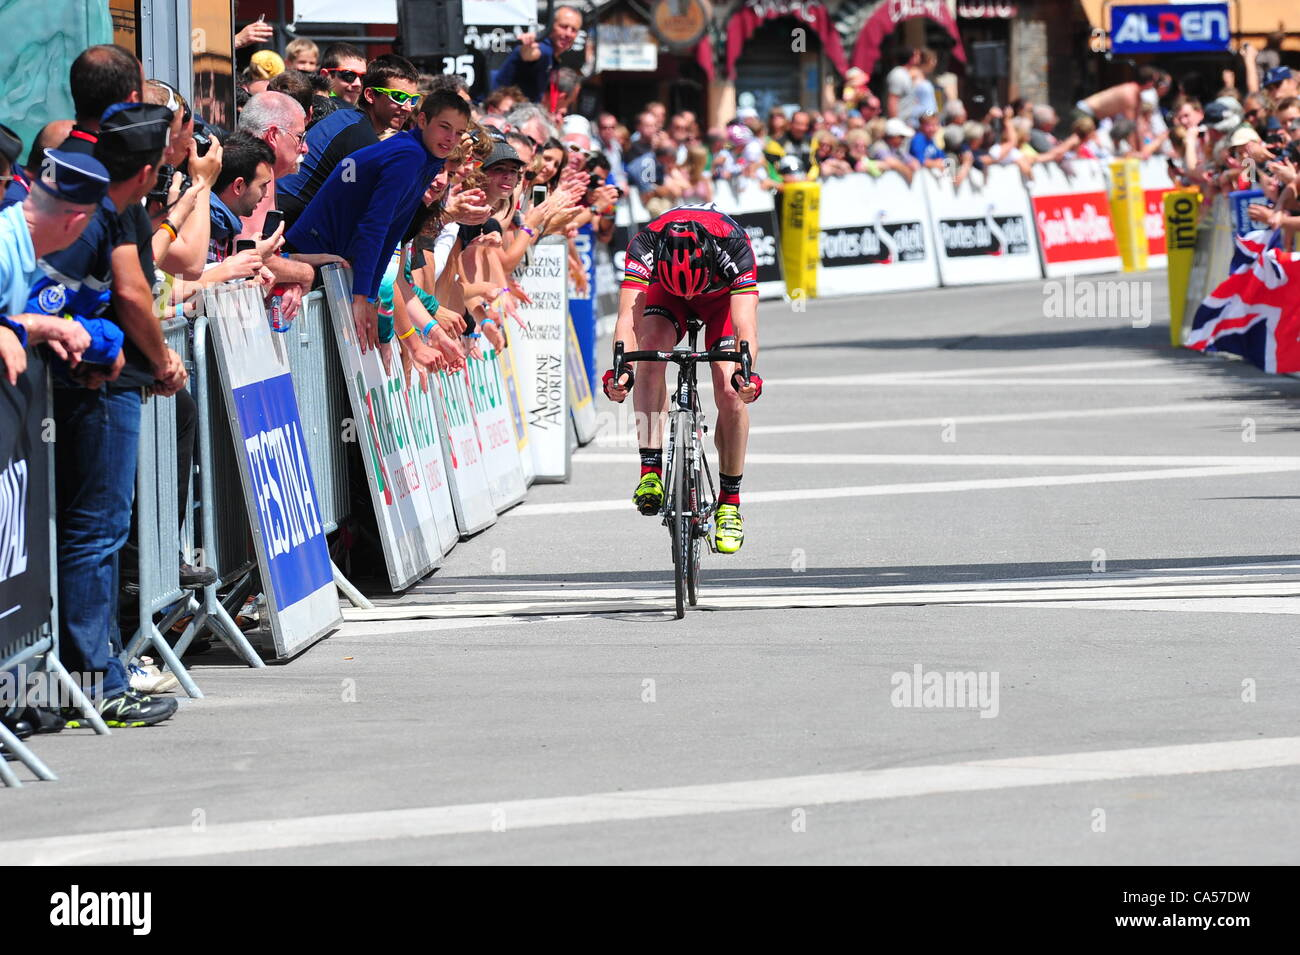 09.06.2012.  Criterium du Dauphine Libere, stage 06 Saint Alban Leysse - Morzine, Bmc Racing 2012, Evans Cadel, Stock Photo